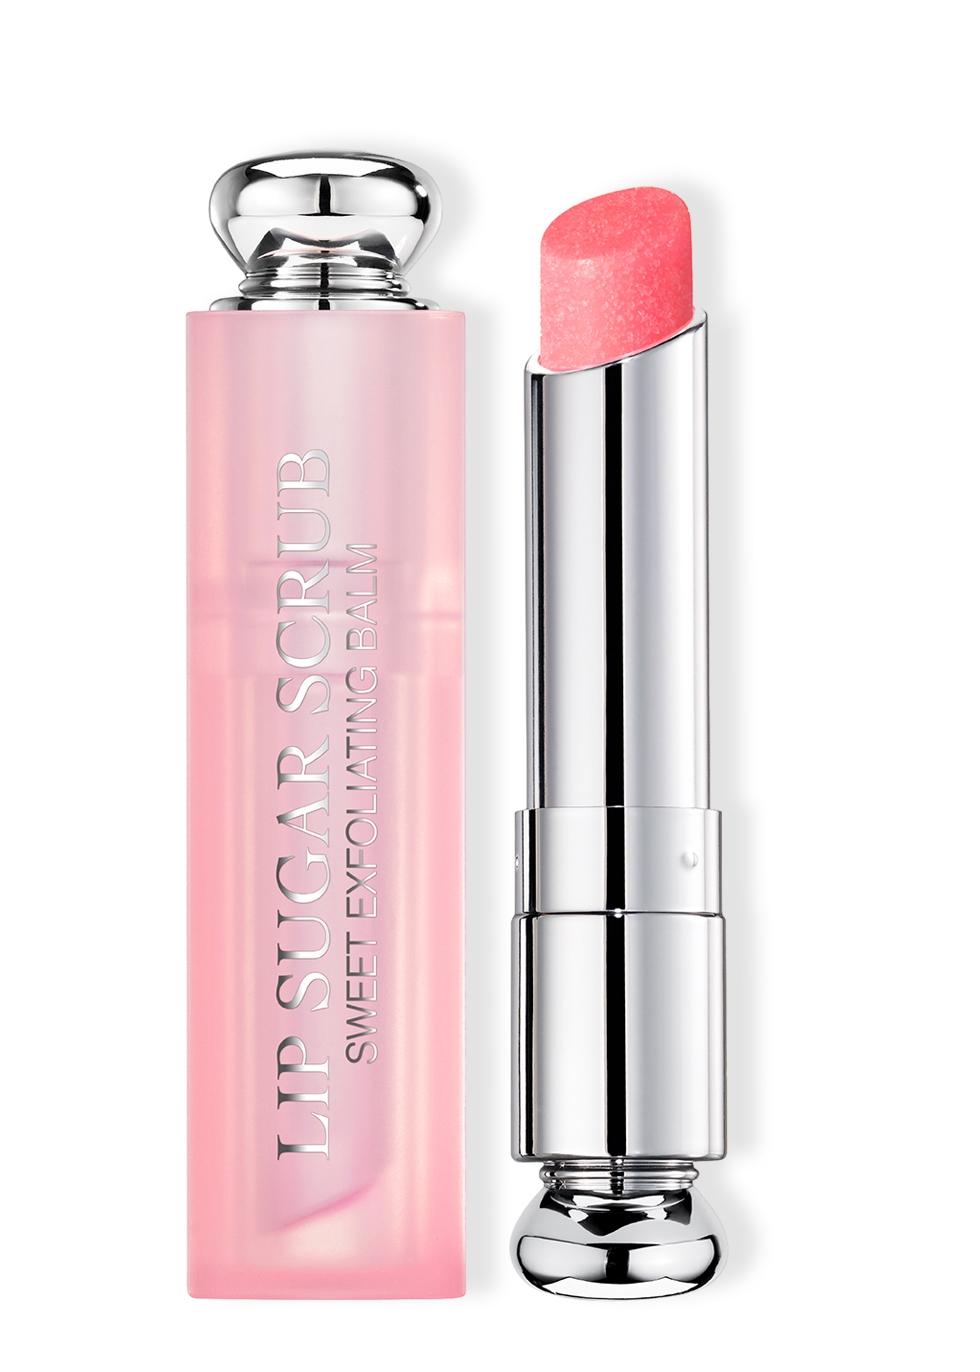 Dior Addict Lip Sugar Scrub - Dior